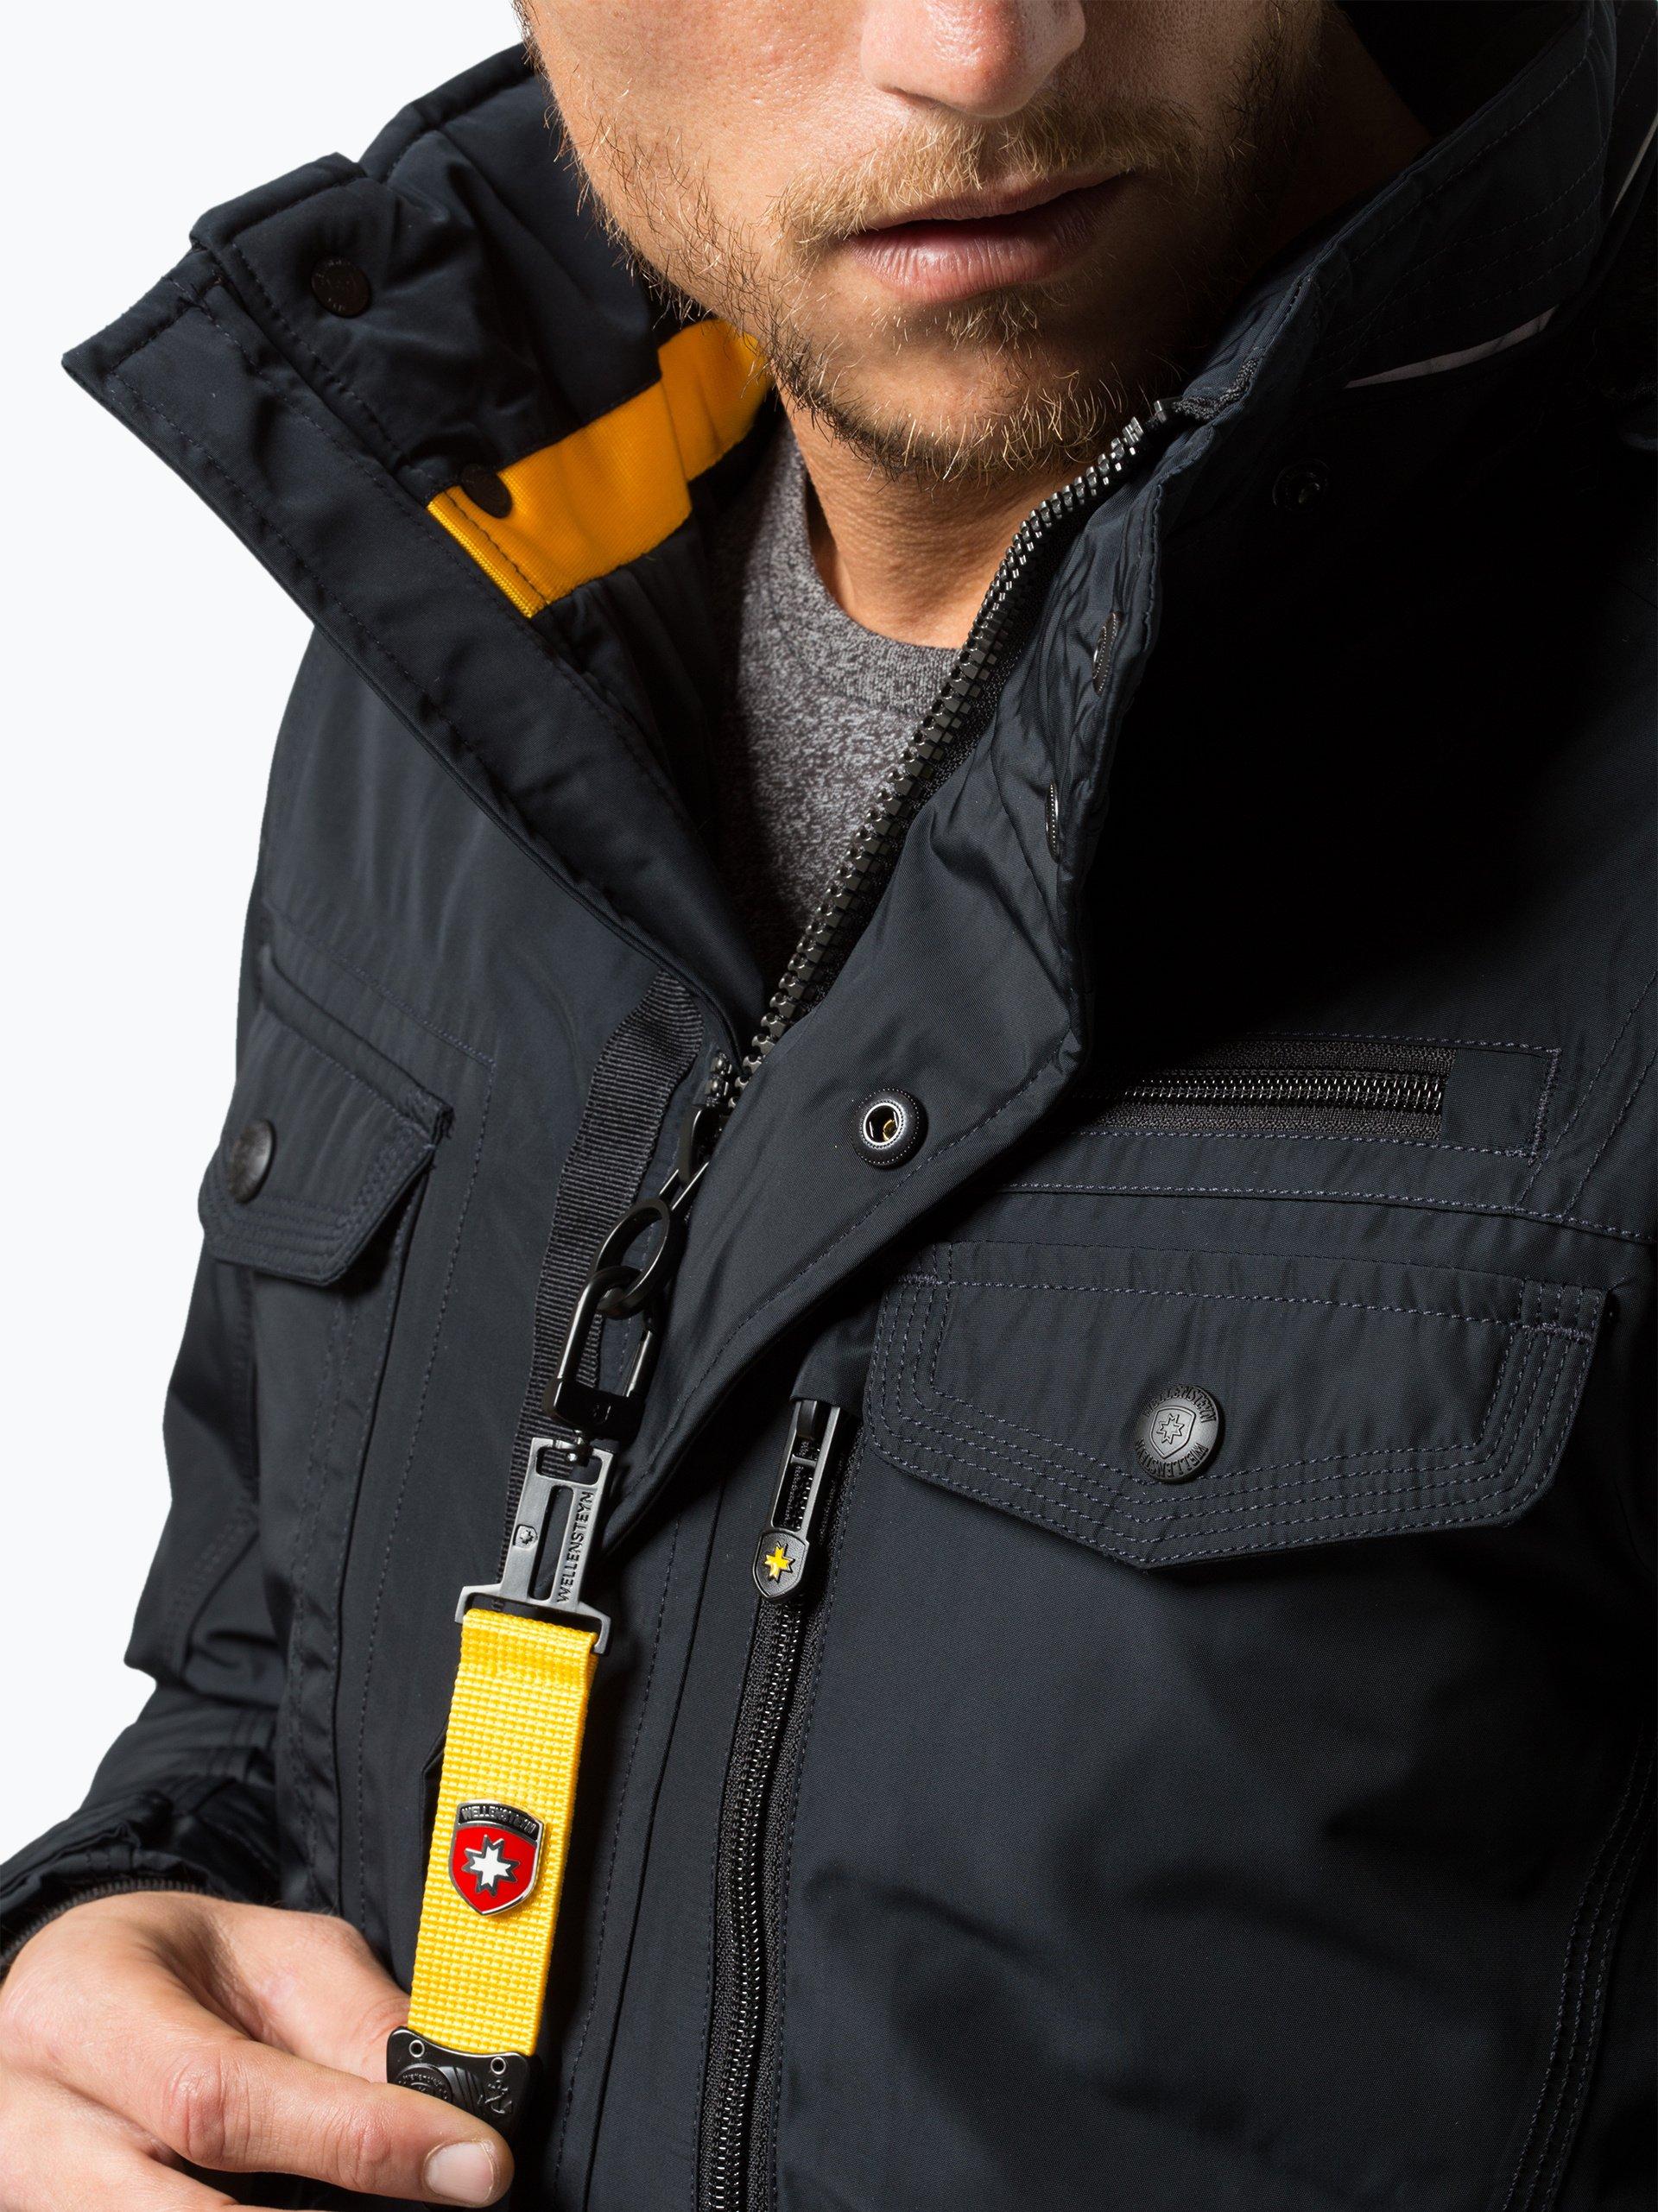 geringster Preis professionelle Website detaillierter Blick Wellensteyn jacke chester winter – Stilvolle Jacken